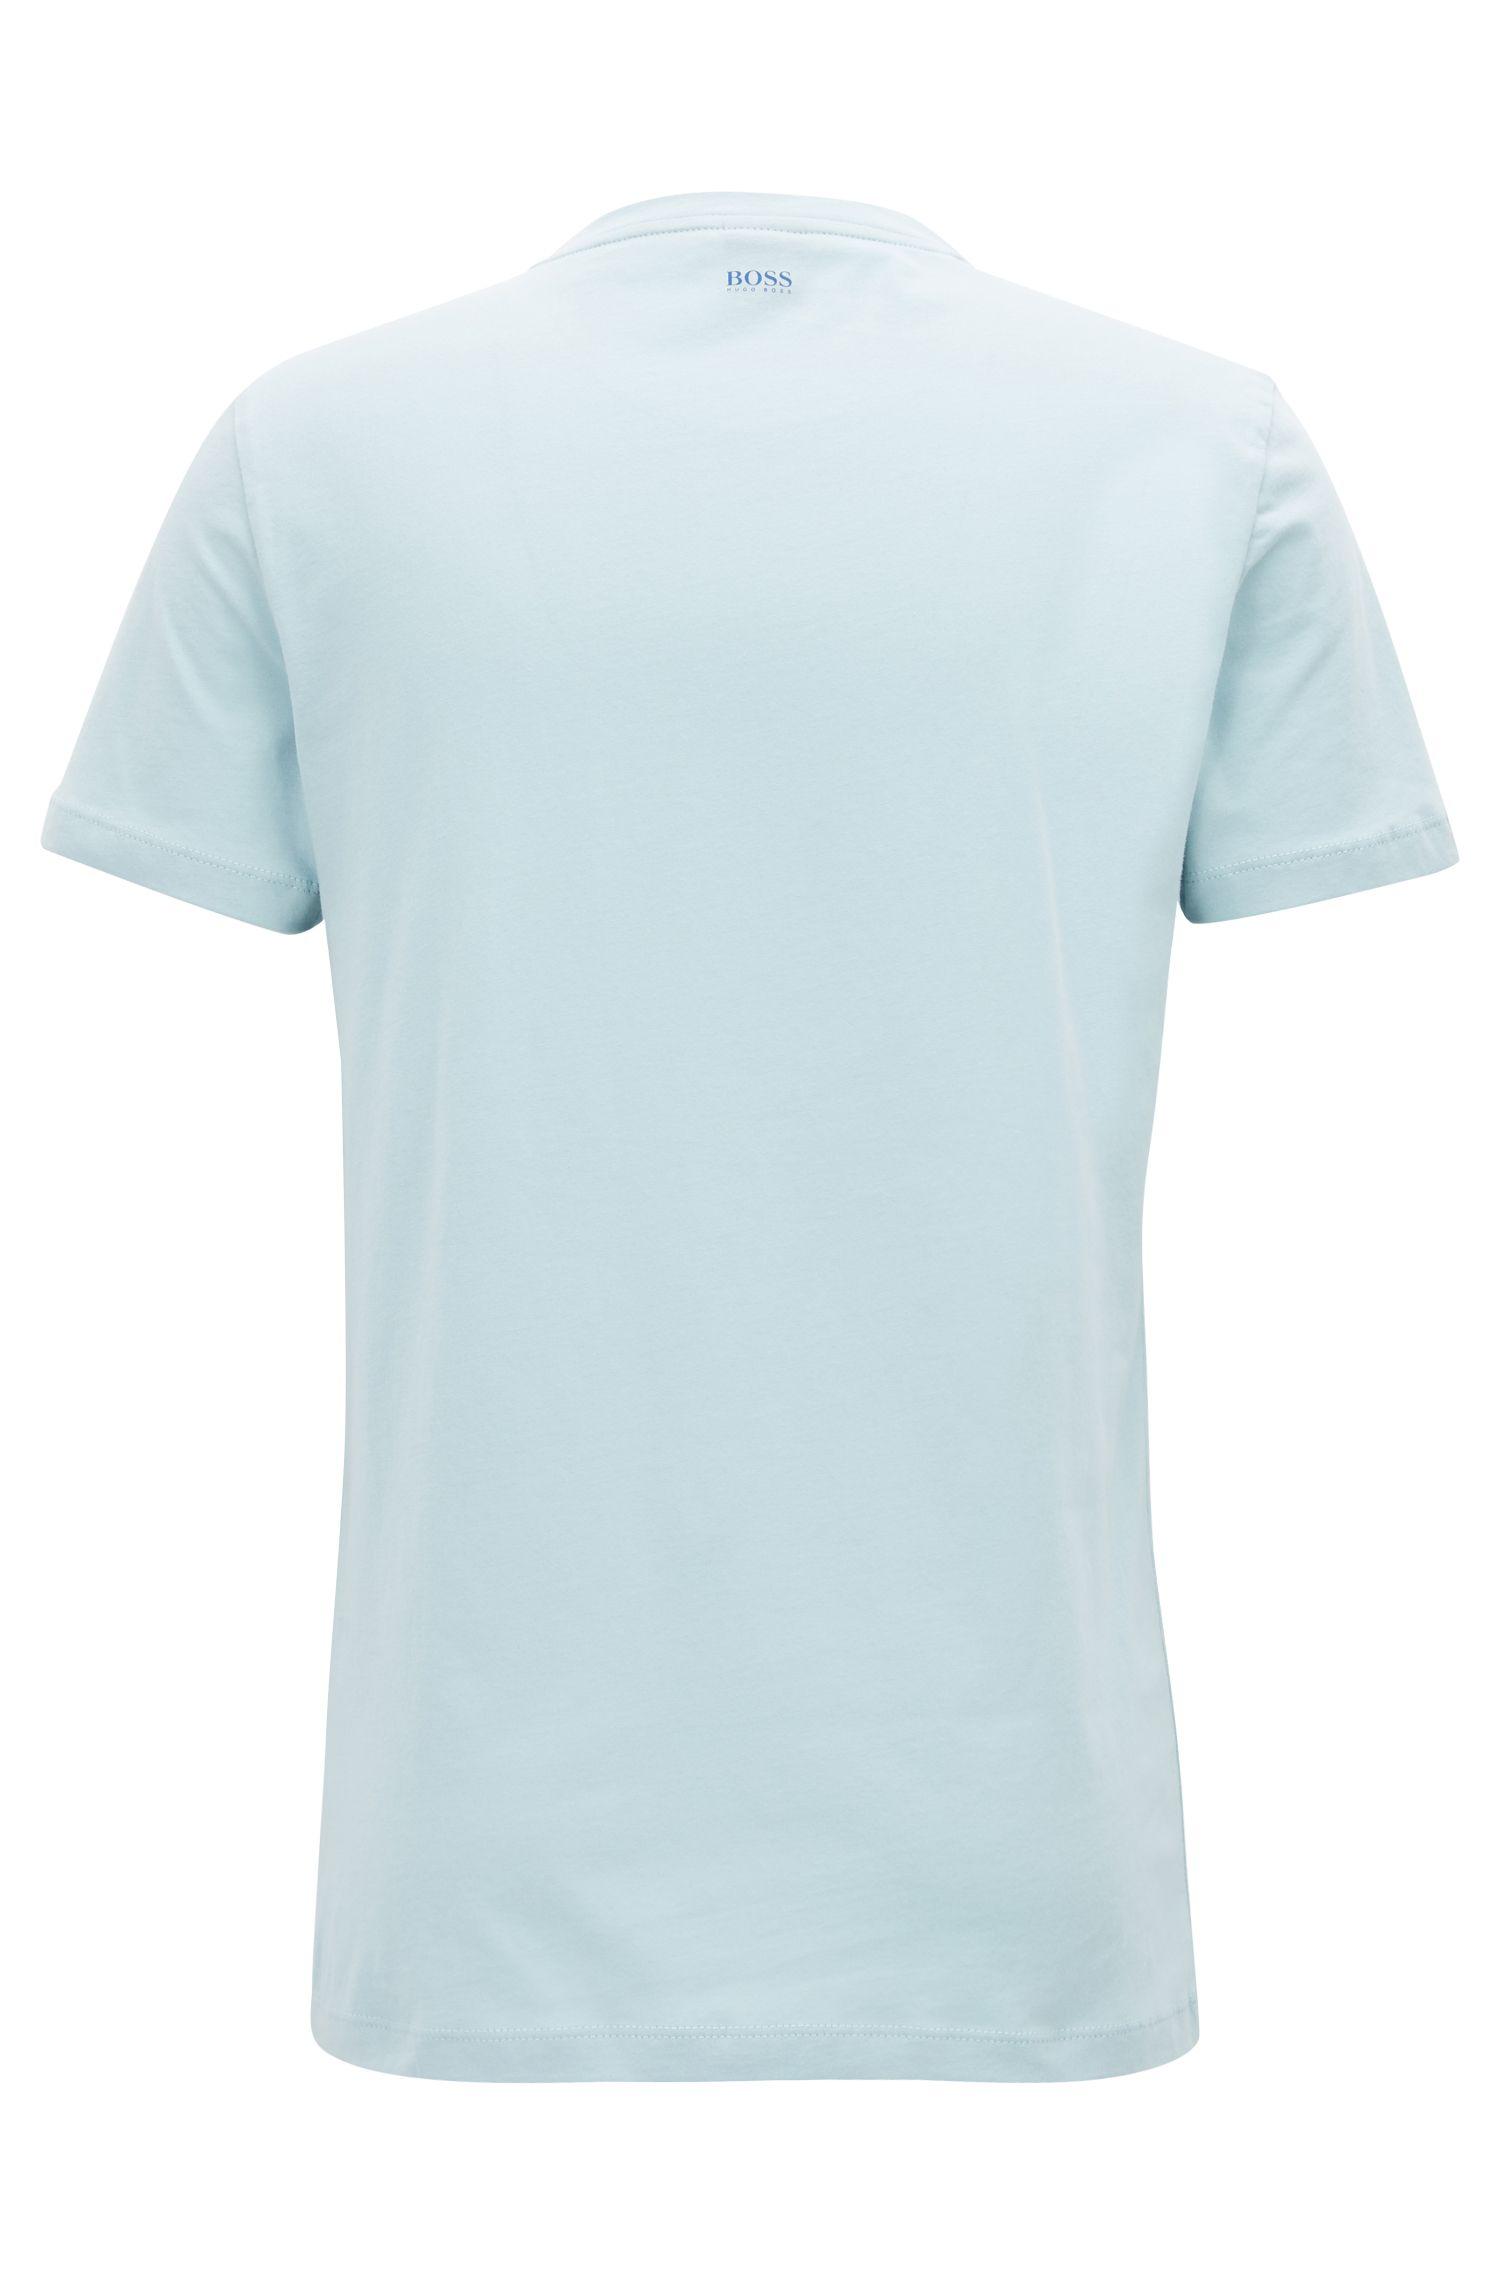 Jersey T-shirt with dégradé flocked logo, Light Blue